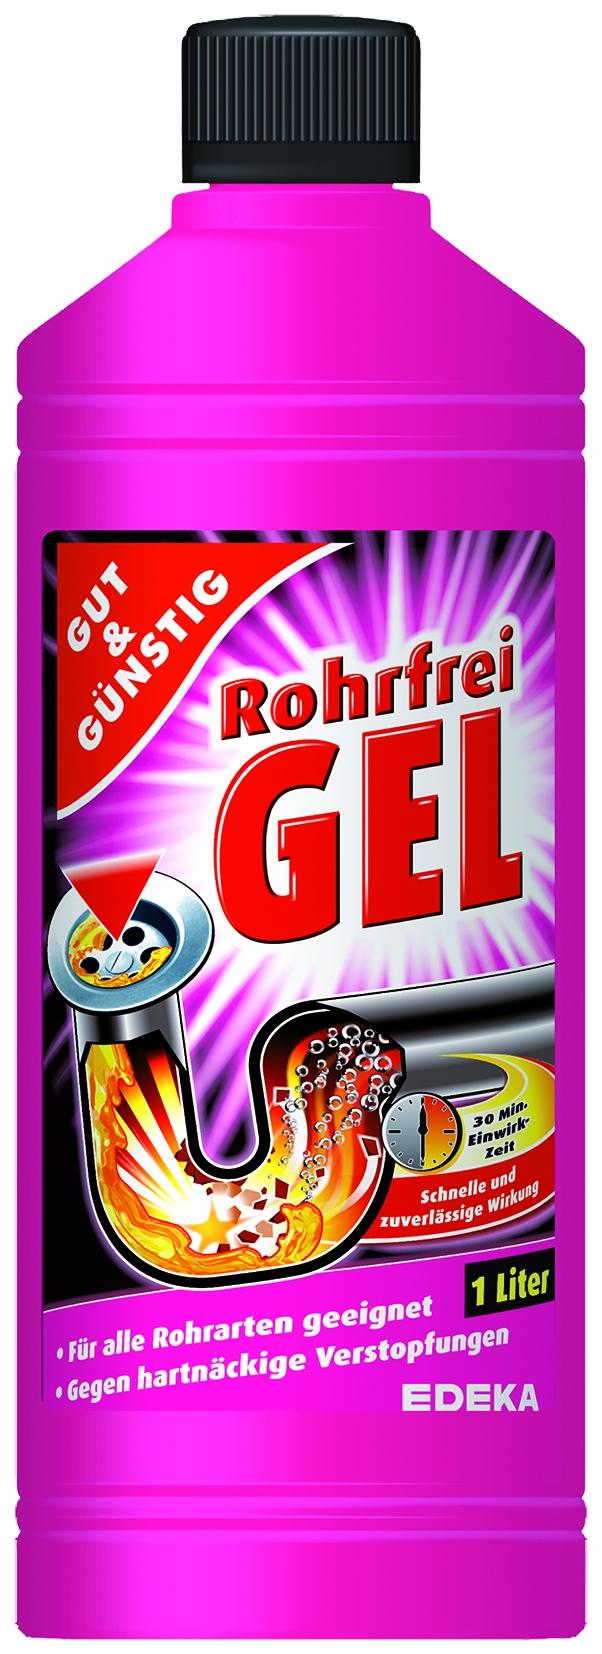 Rohrfrei Gel